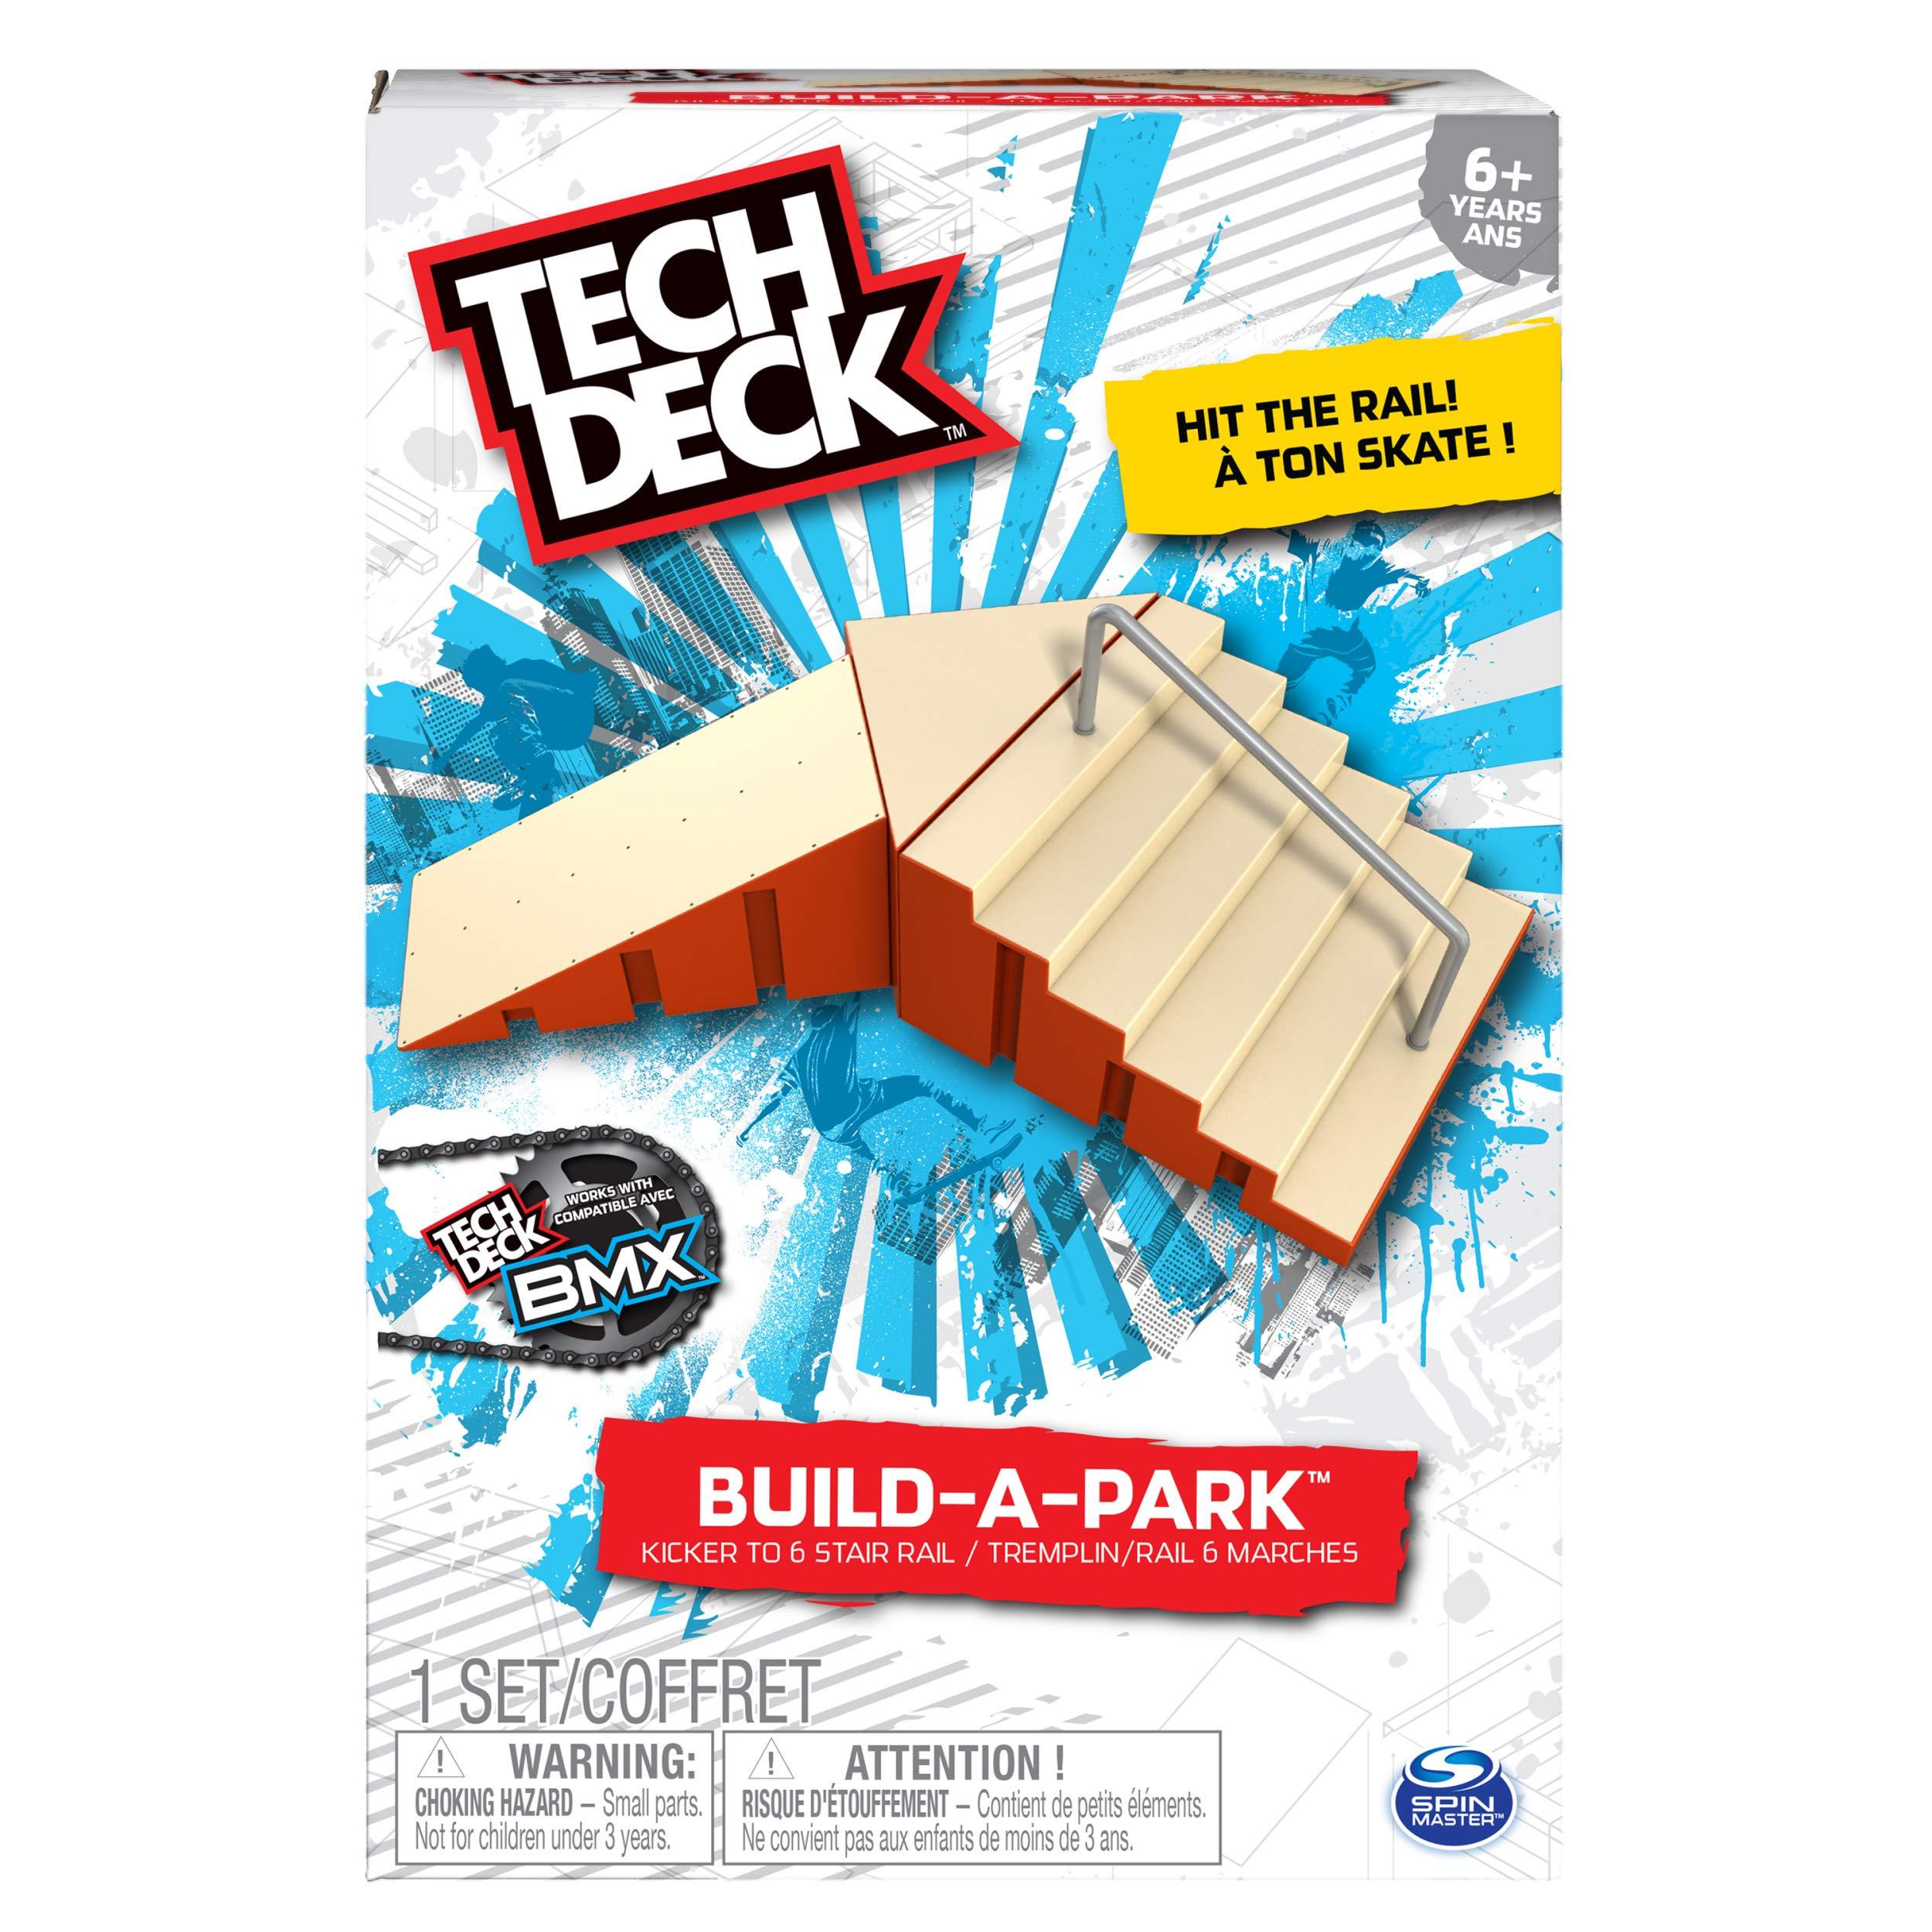 Tech Deck - Build-A-Park - Kicker to 6 Stair Rail (Red)